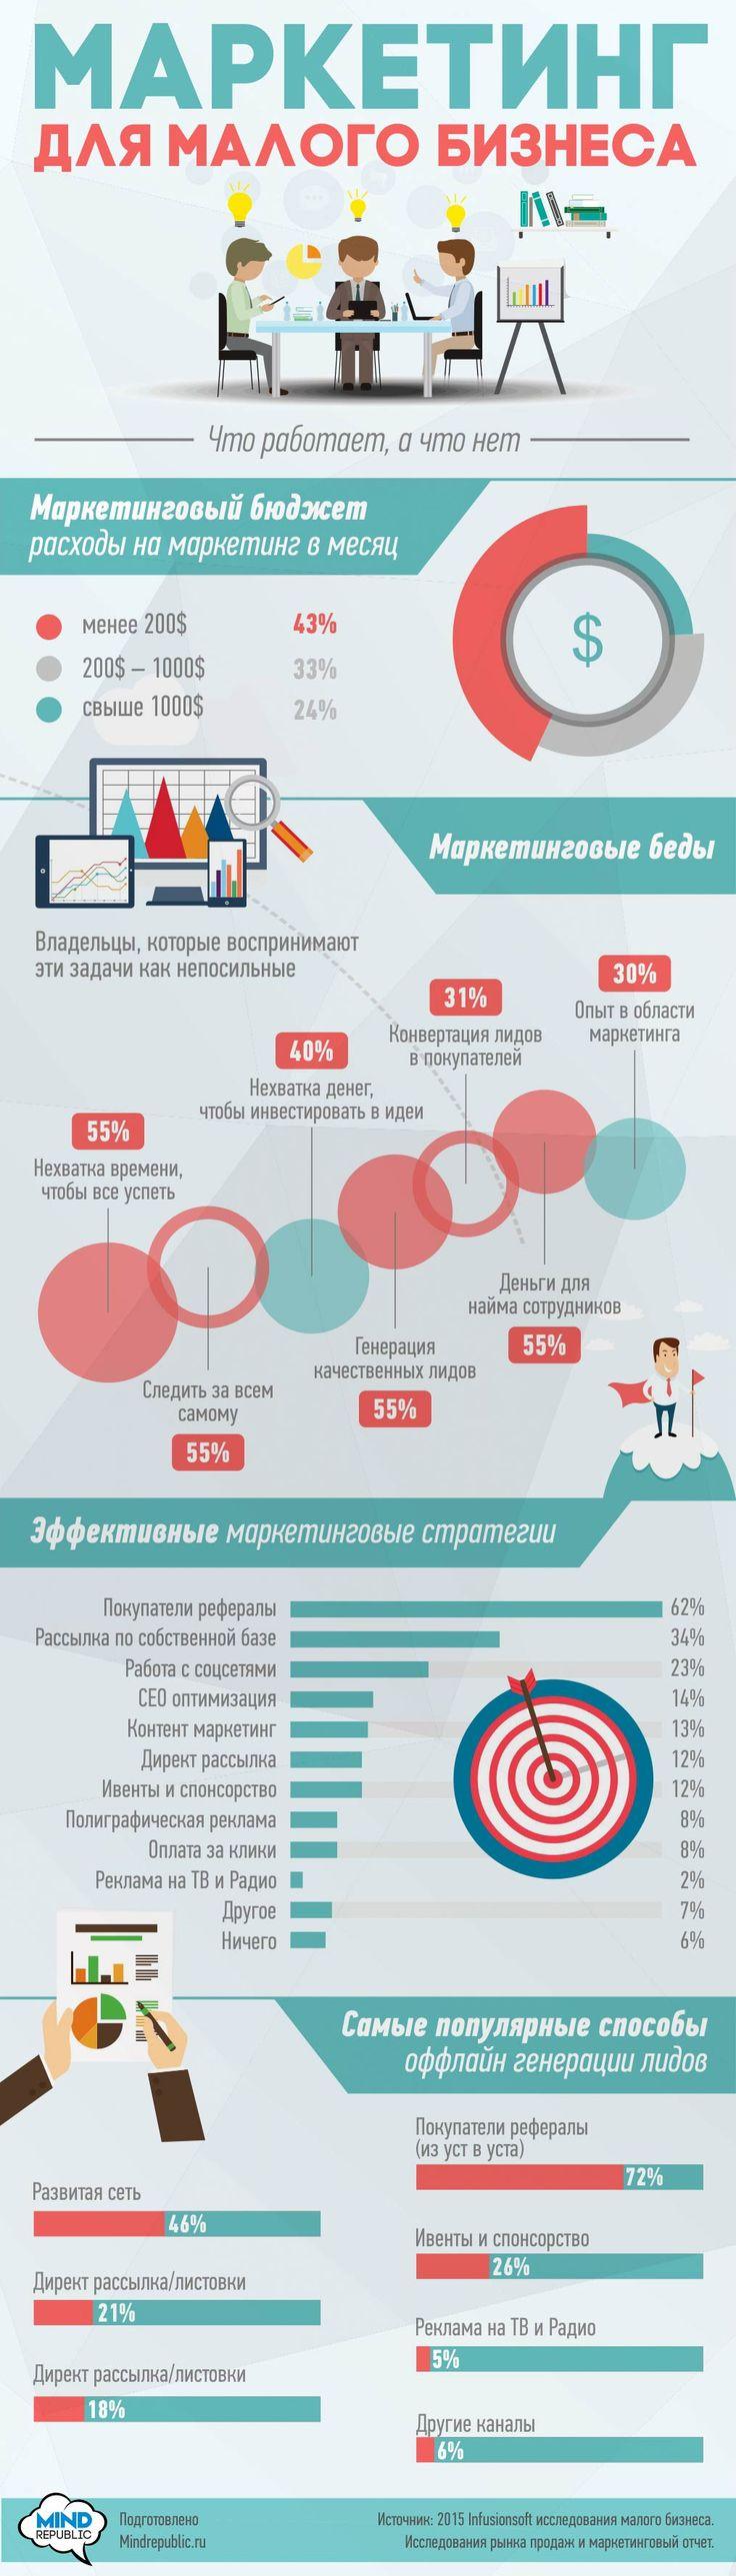 Маркетинг для малого бизнеса. Инфографика. Small business marketing. Infografics.